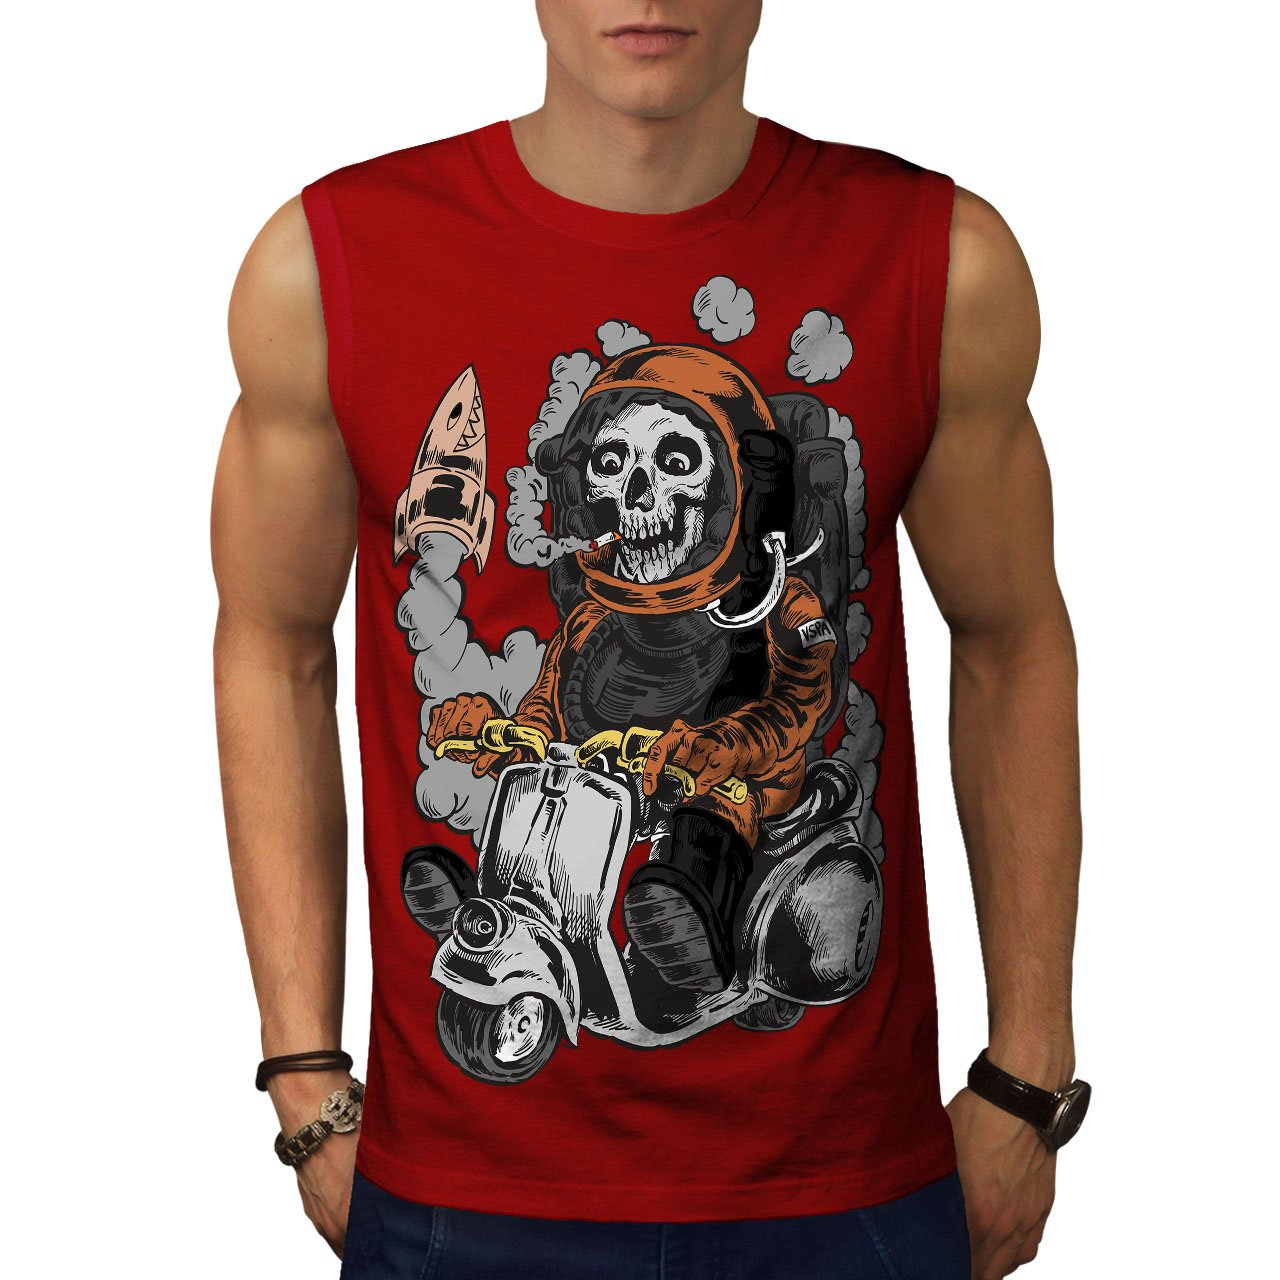 Wellcoda Dead Astronaut Mens Sleevless T-Shirt, Skeleton Active Top Shirt